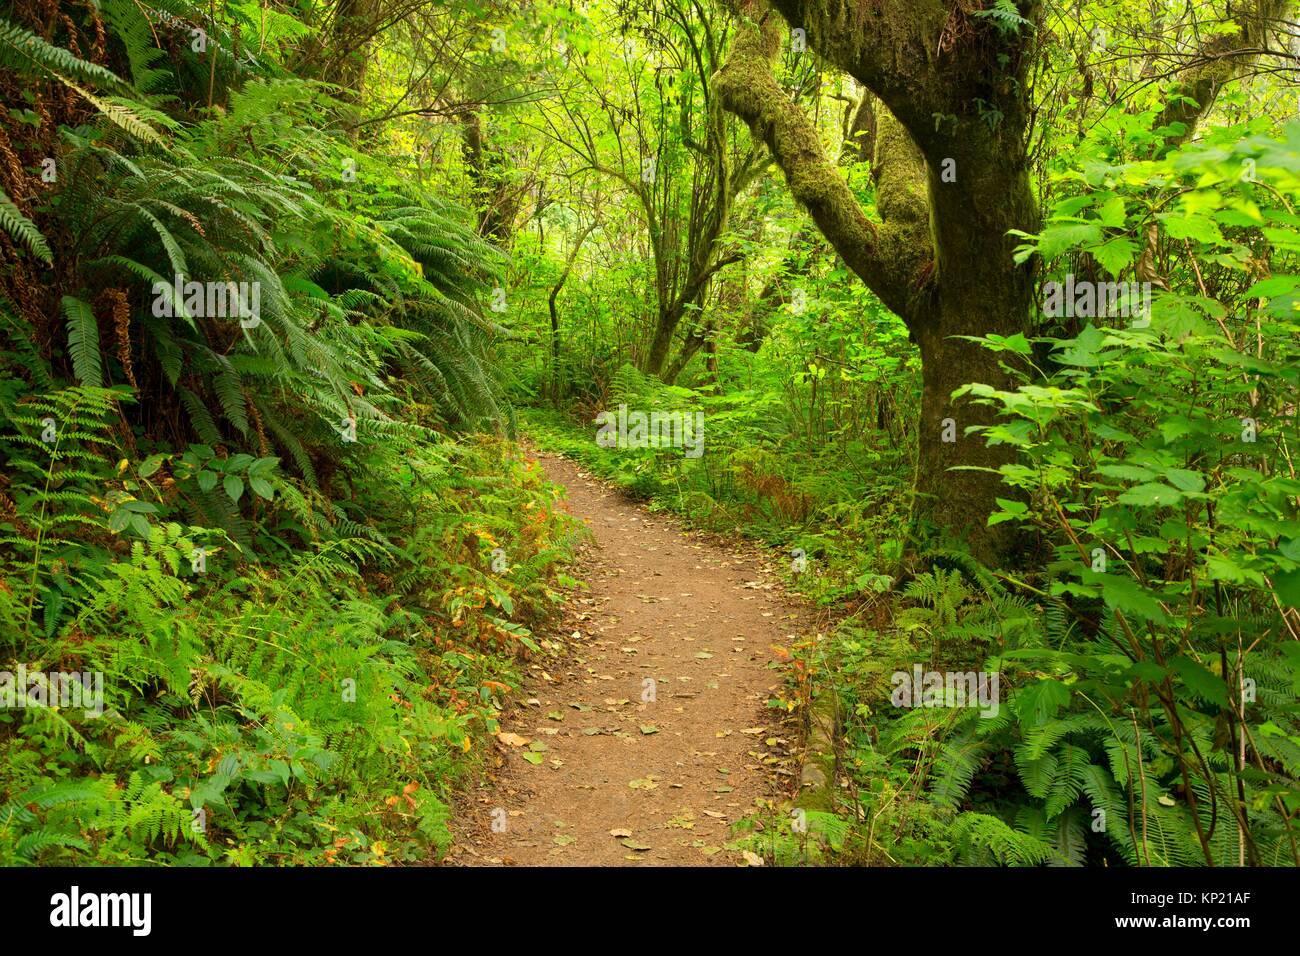 Giant Spruce Trail, Cape Perpetua Scenic Area, Siuslaw National Forest, Oregon. - Stock Image